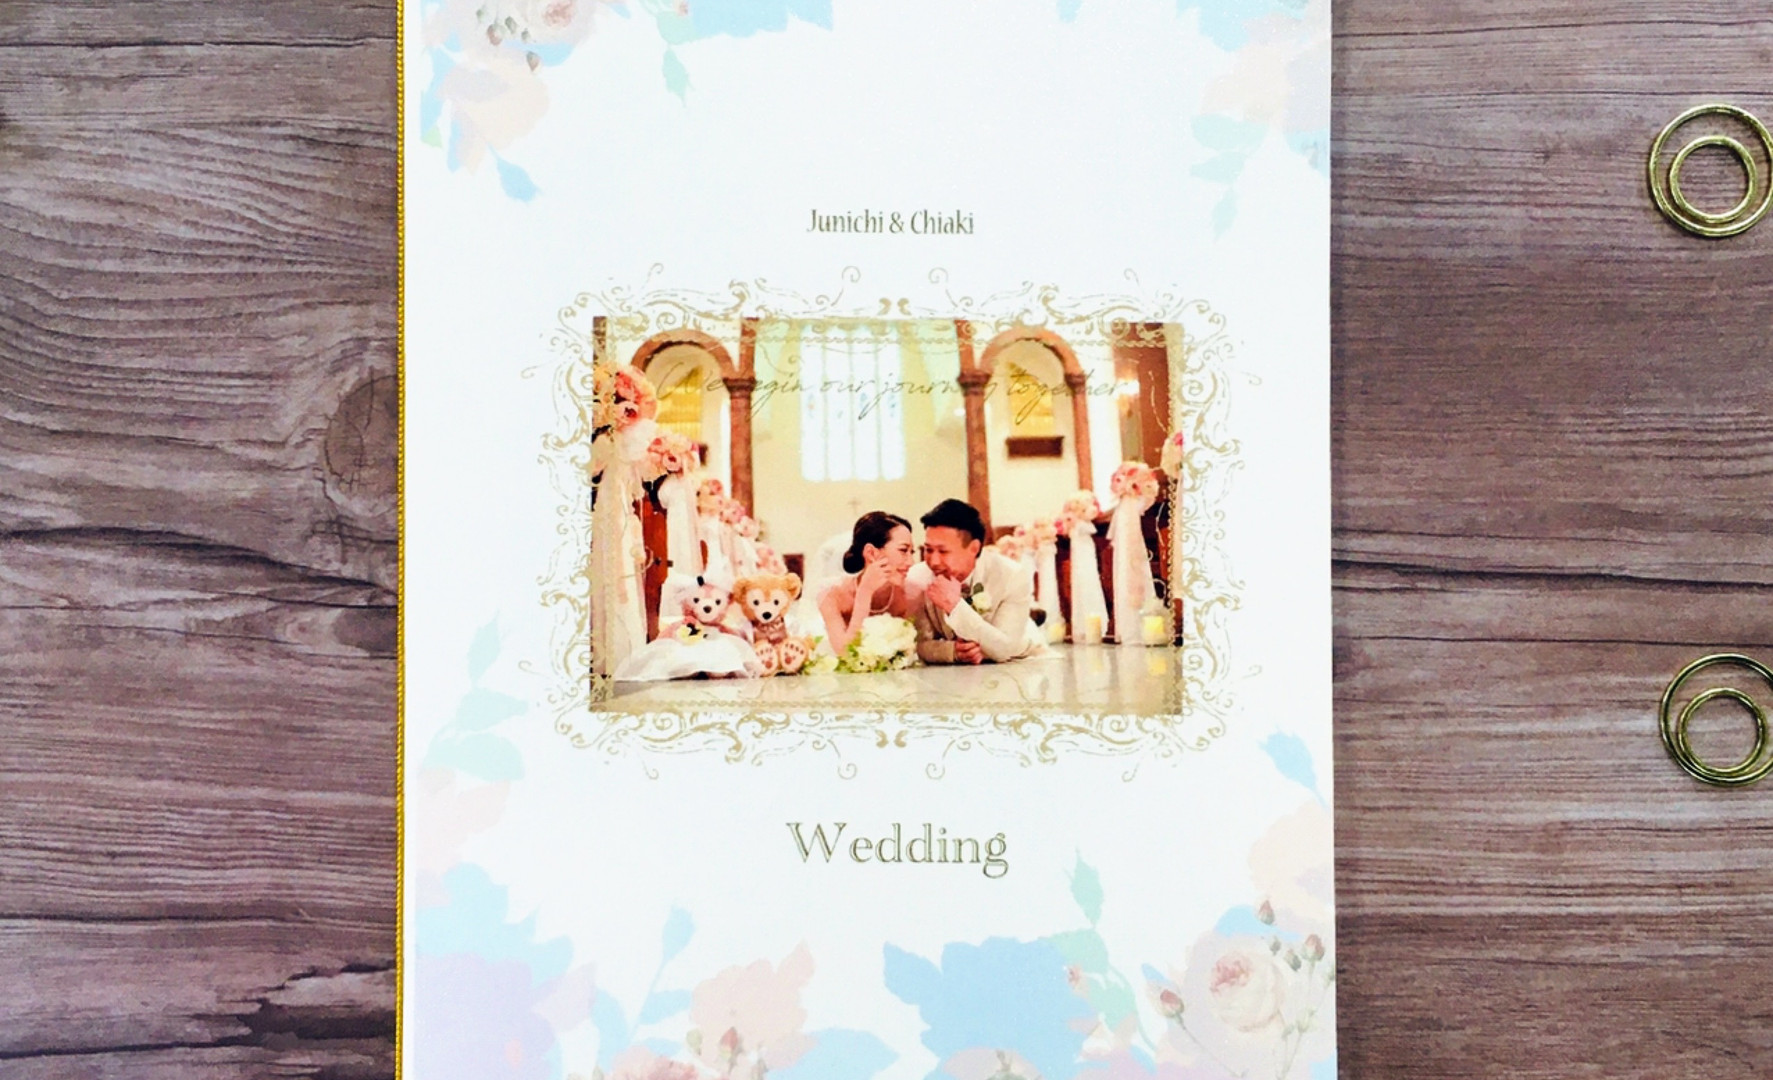 Just married デザイン3-B-1.jpg